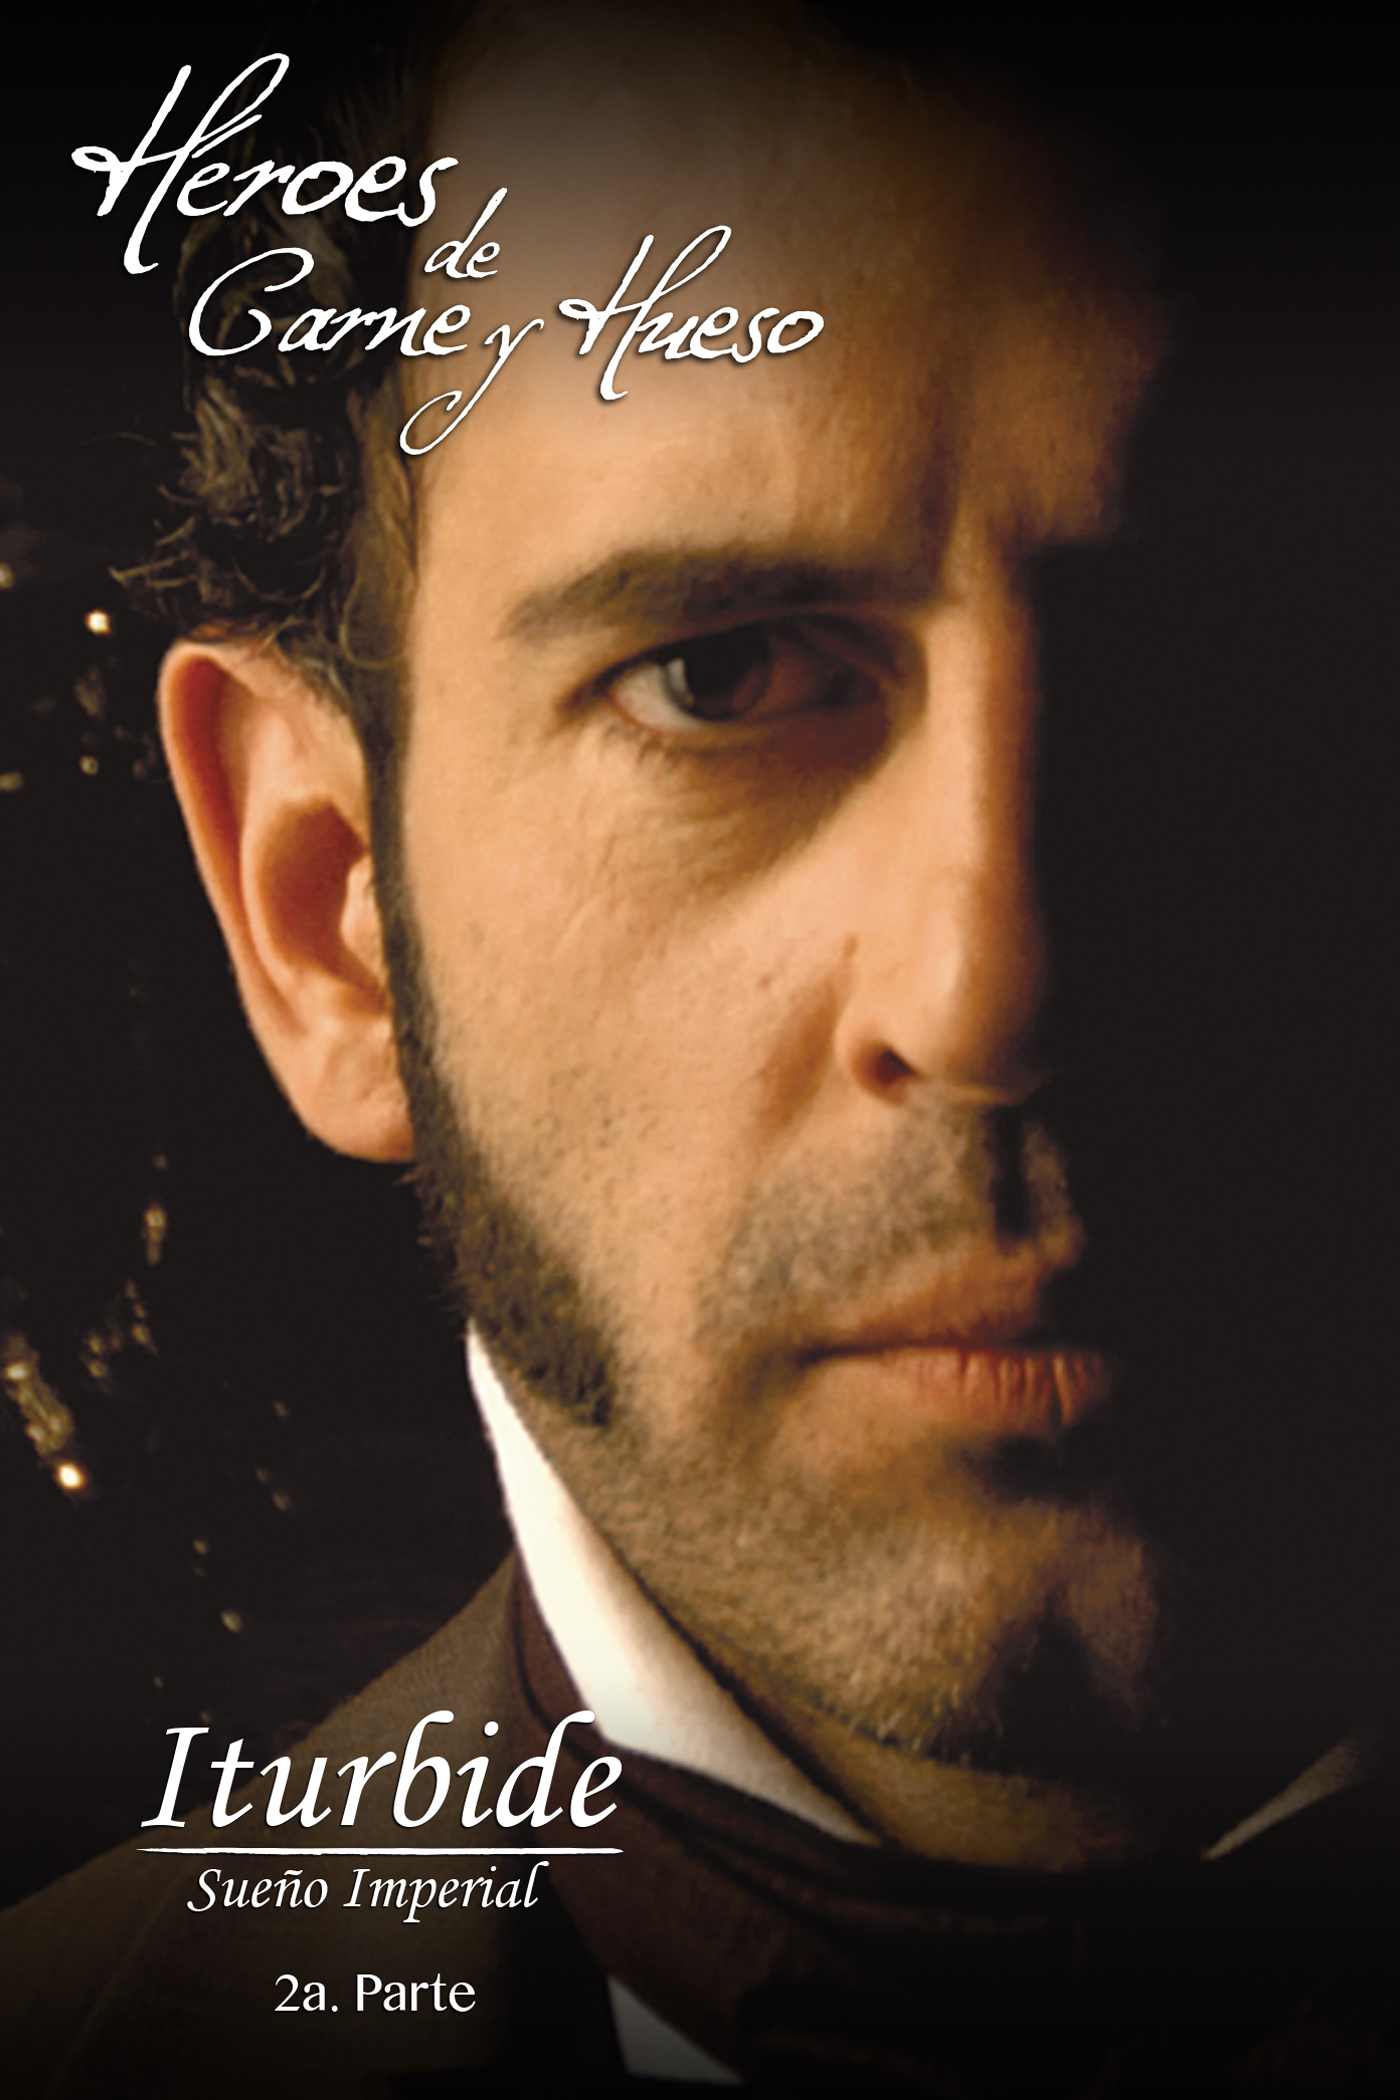 Iturbide pt 2 - Poster.jpg